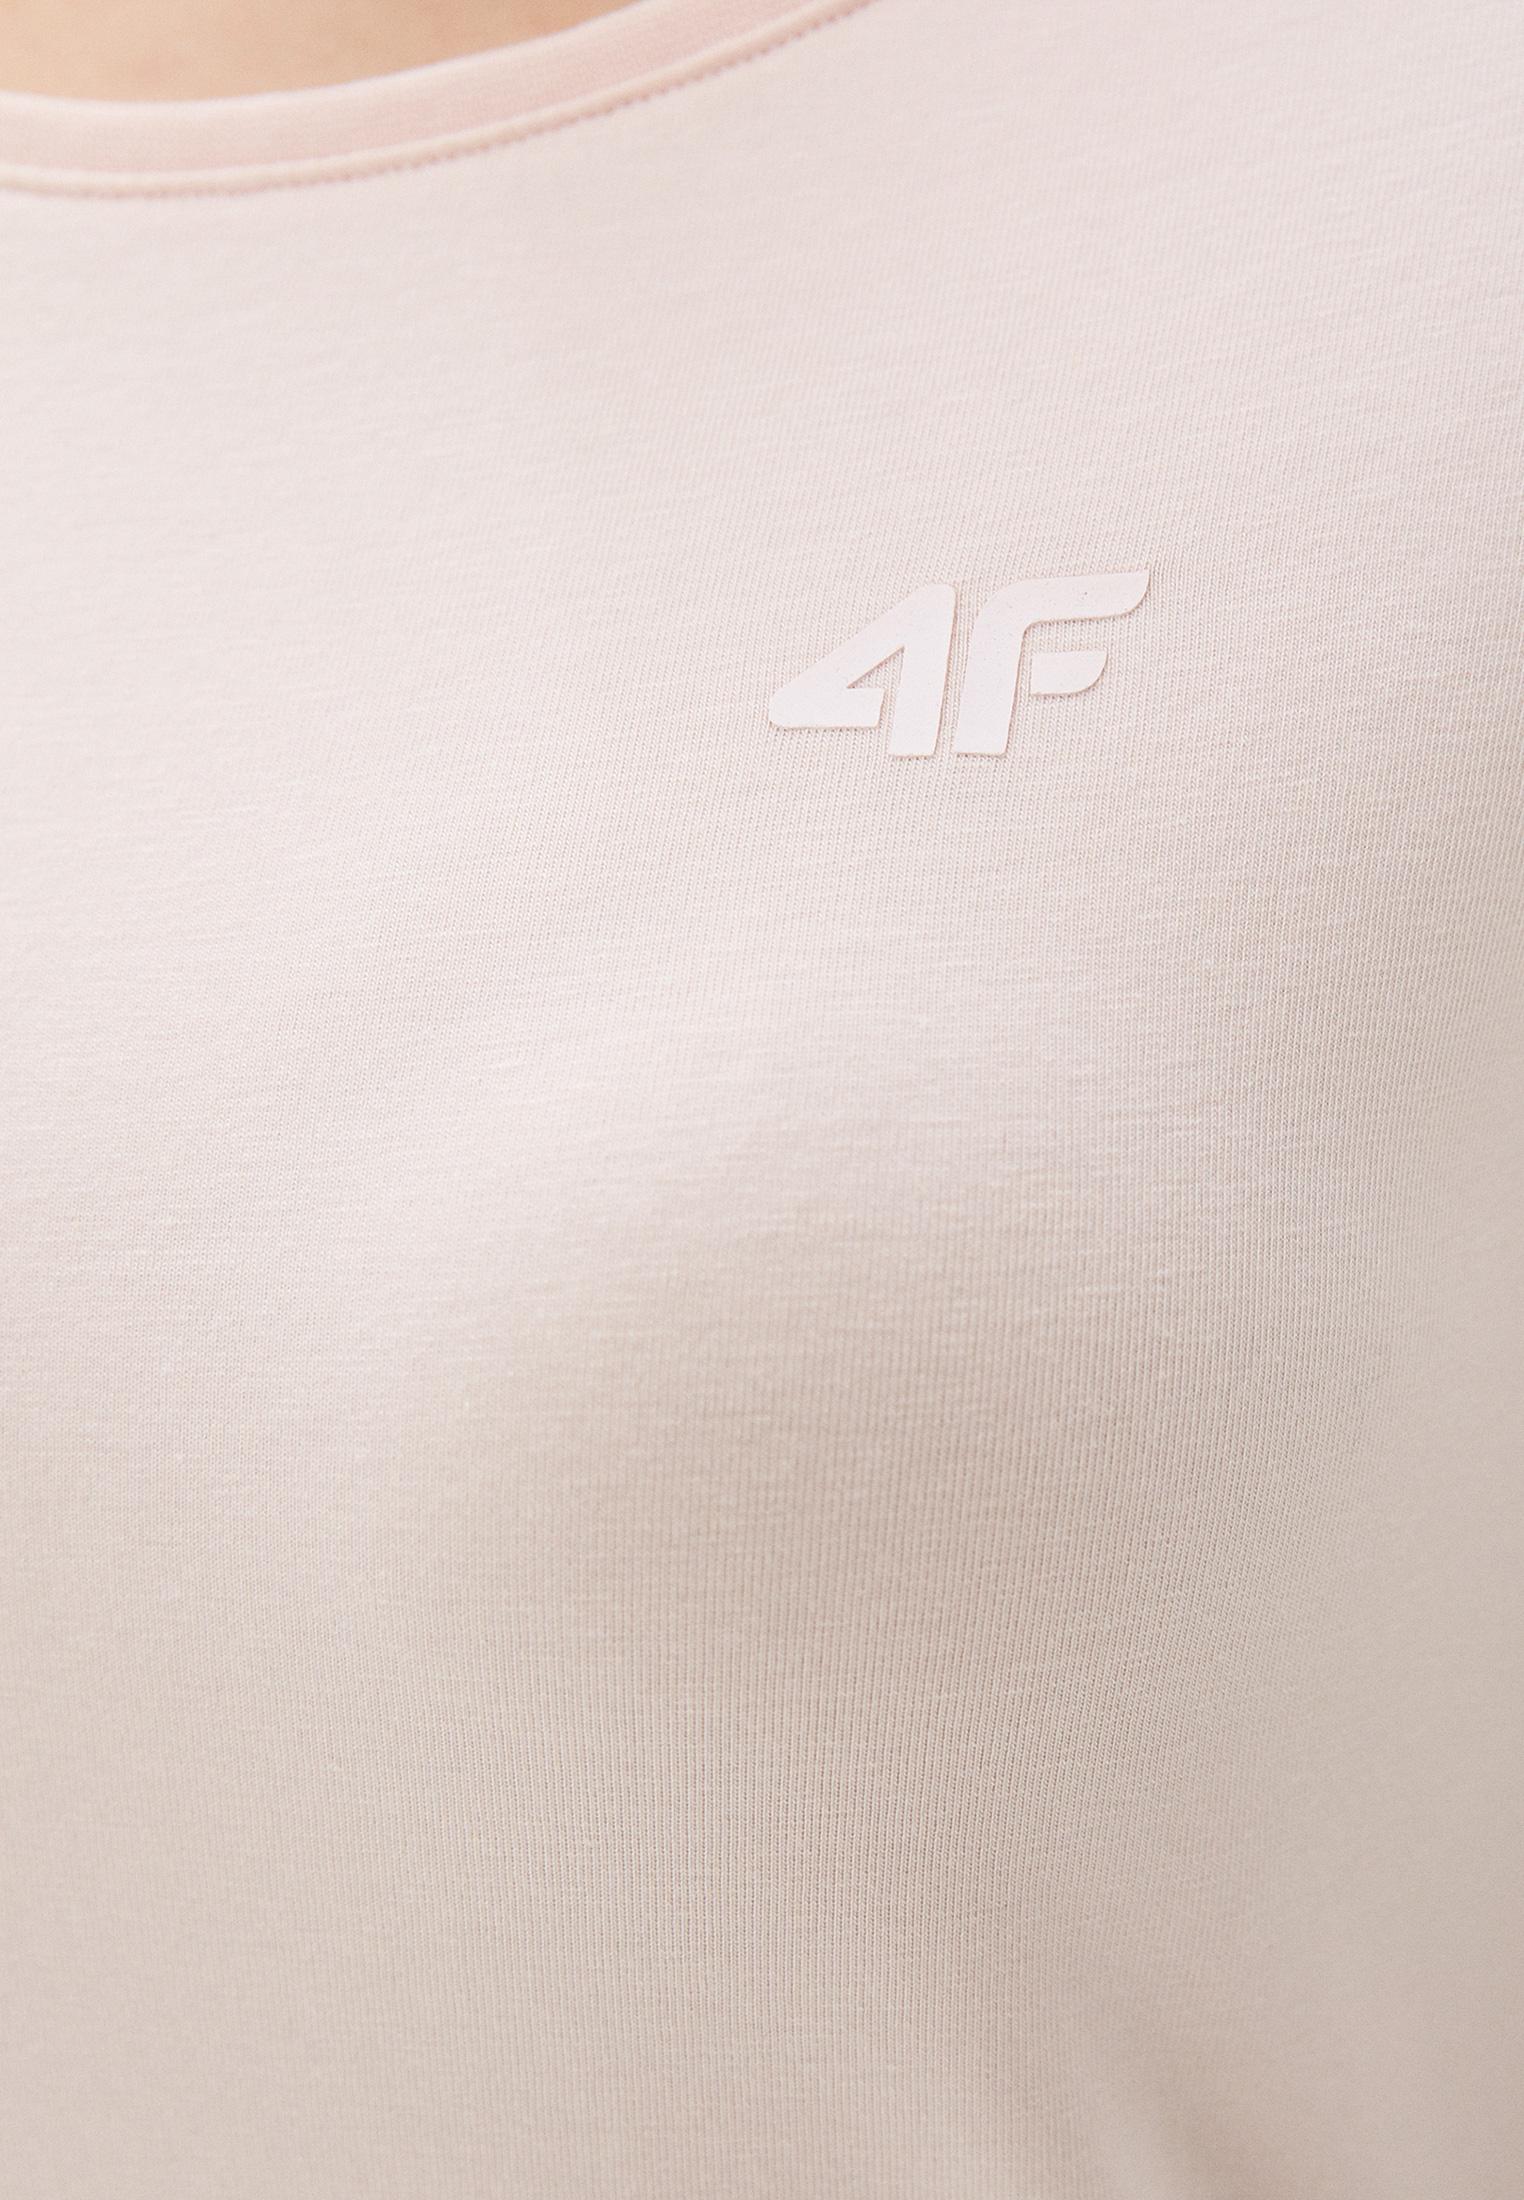 4F NOSH4-TSD001: изображение 4